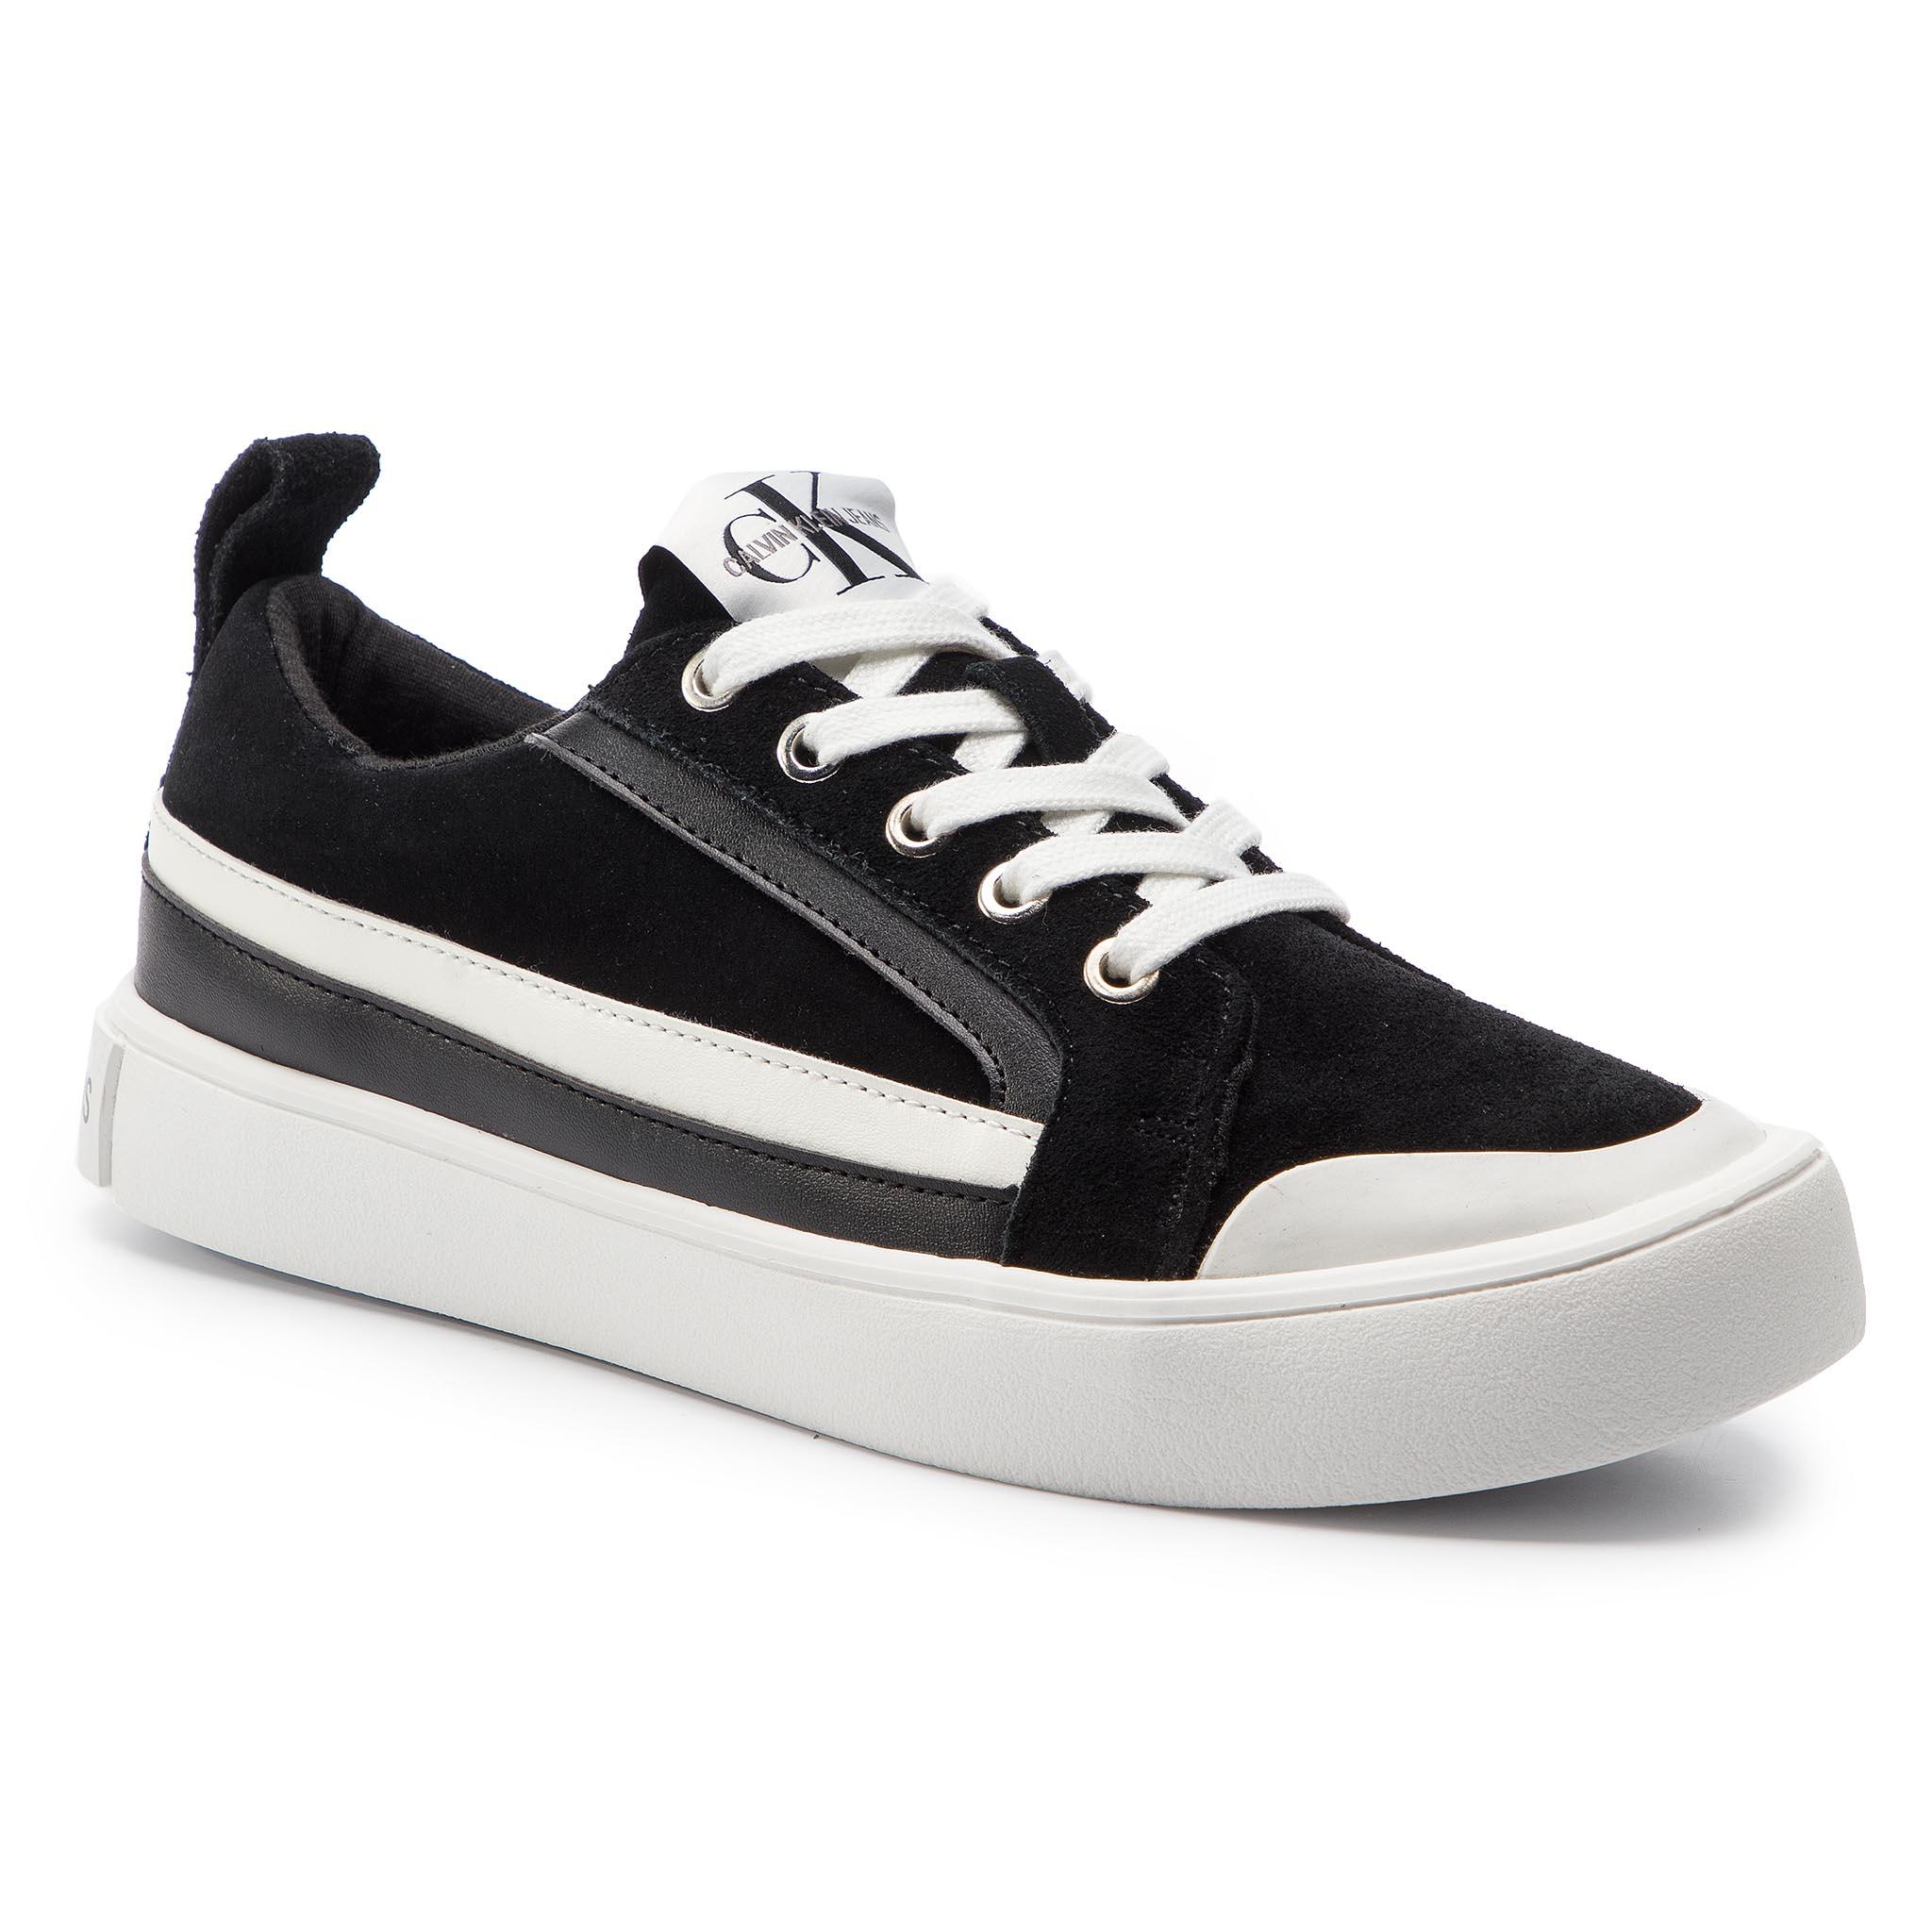 Image of Sneakers CALVIN KLEIN JEANS - Dino S0613 Black/White/Black